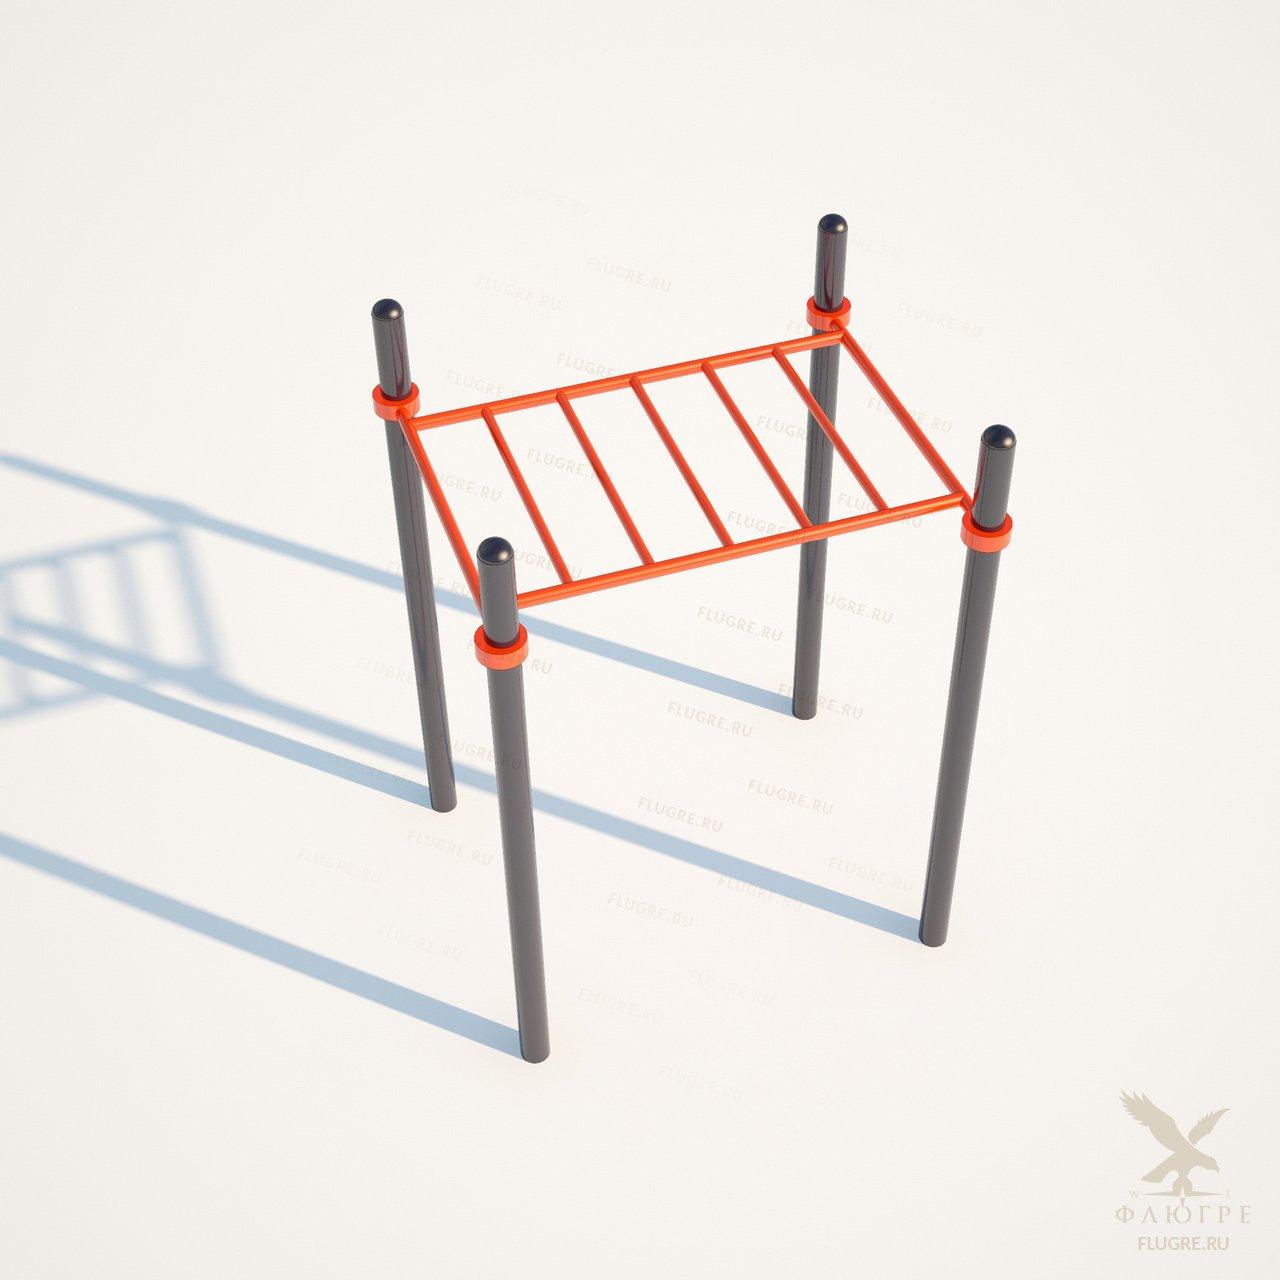 Рукоход горизонтальная лестница Workoutcity W-019